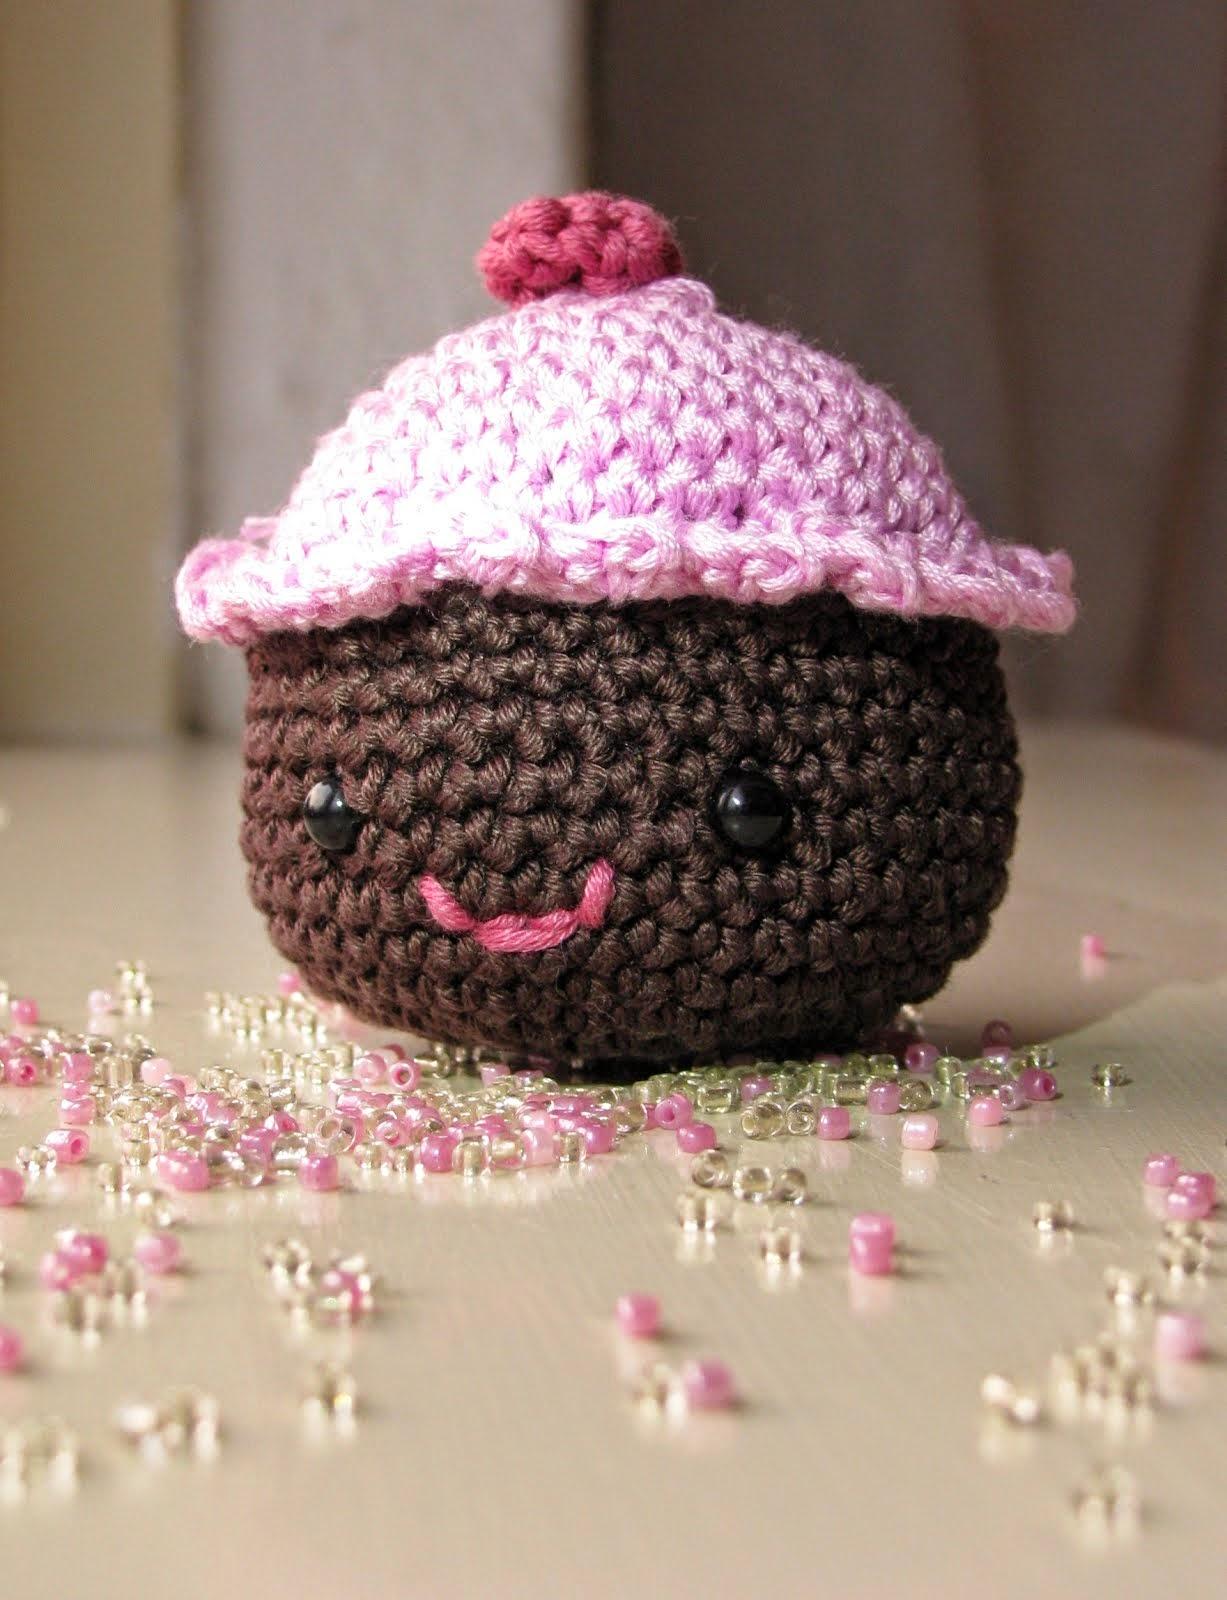 Because cupcakes!